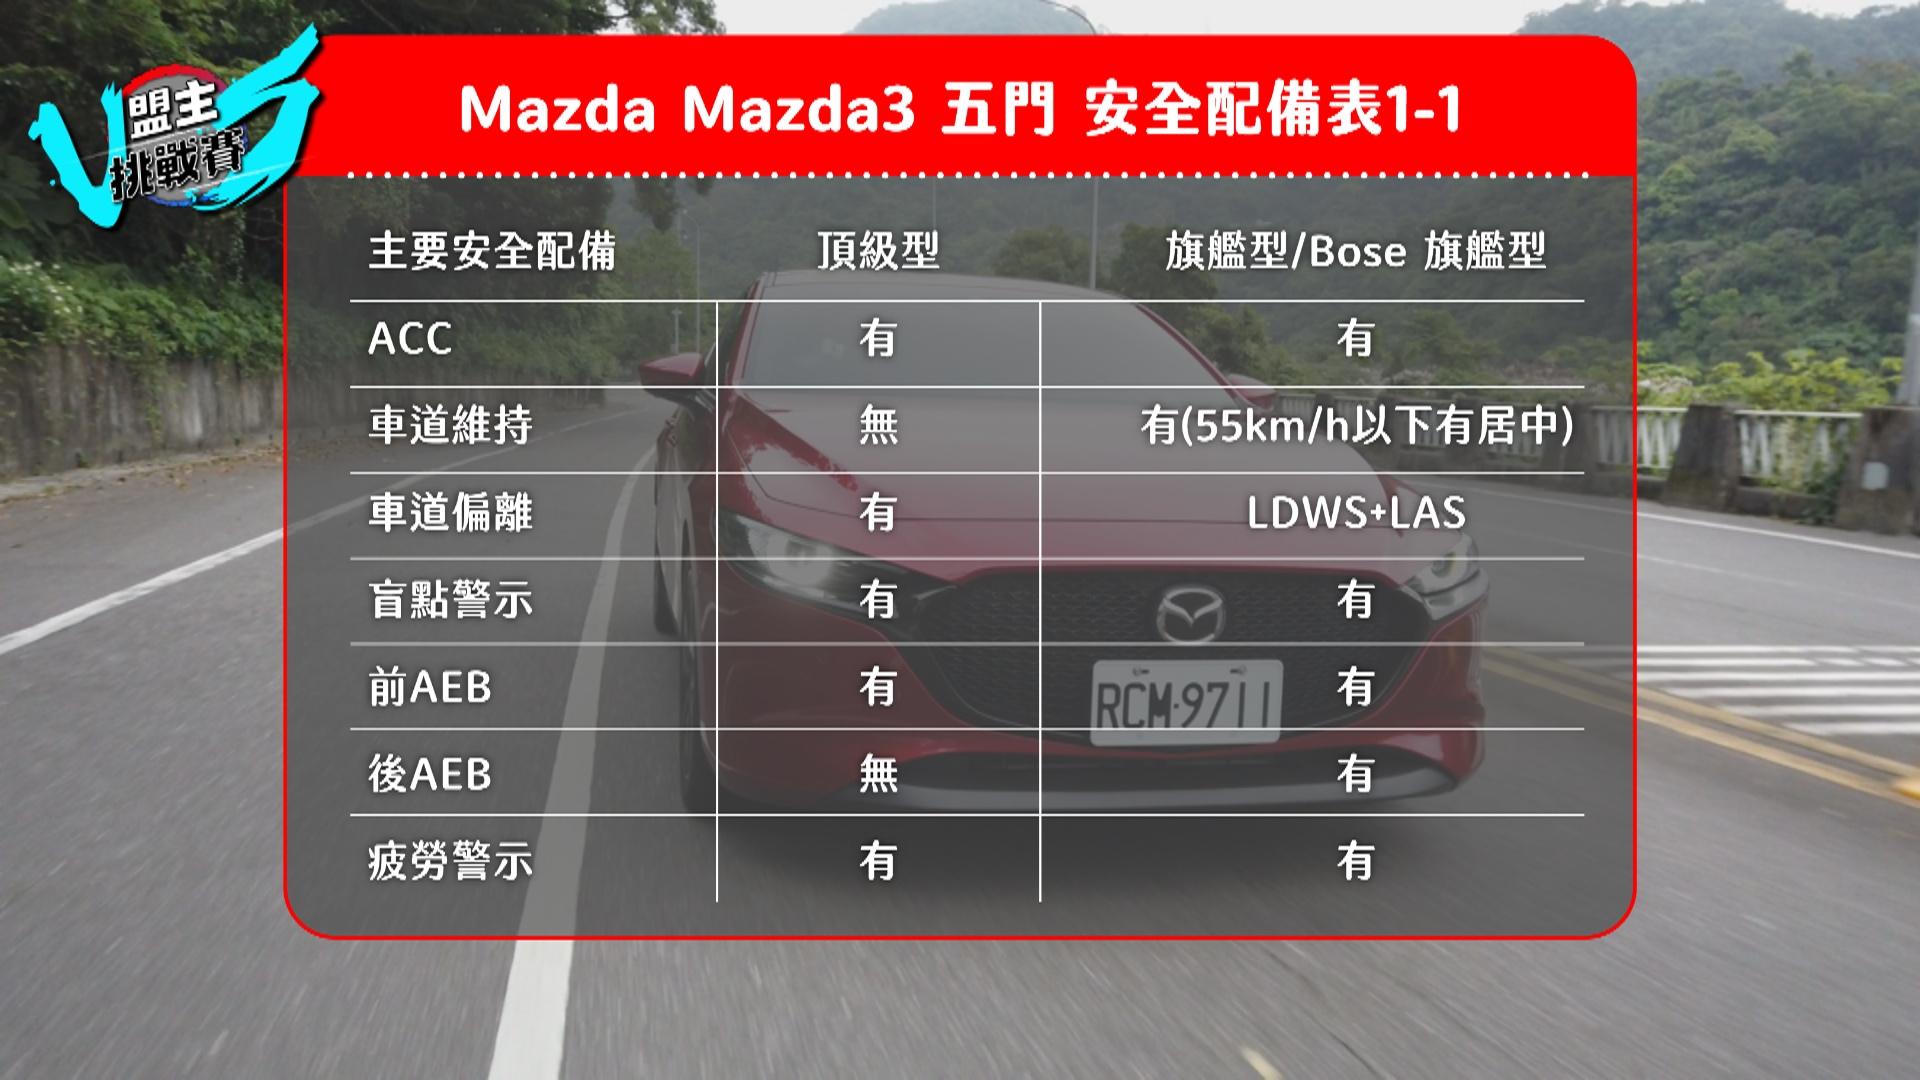 Mazda3 同樣也有挺完整的 ADAS 系統。